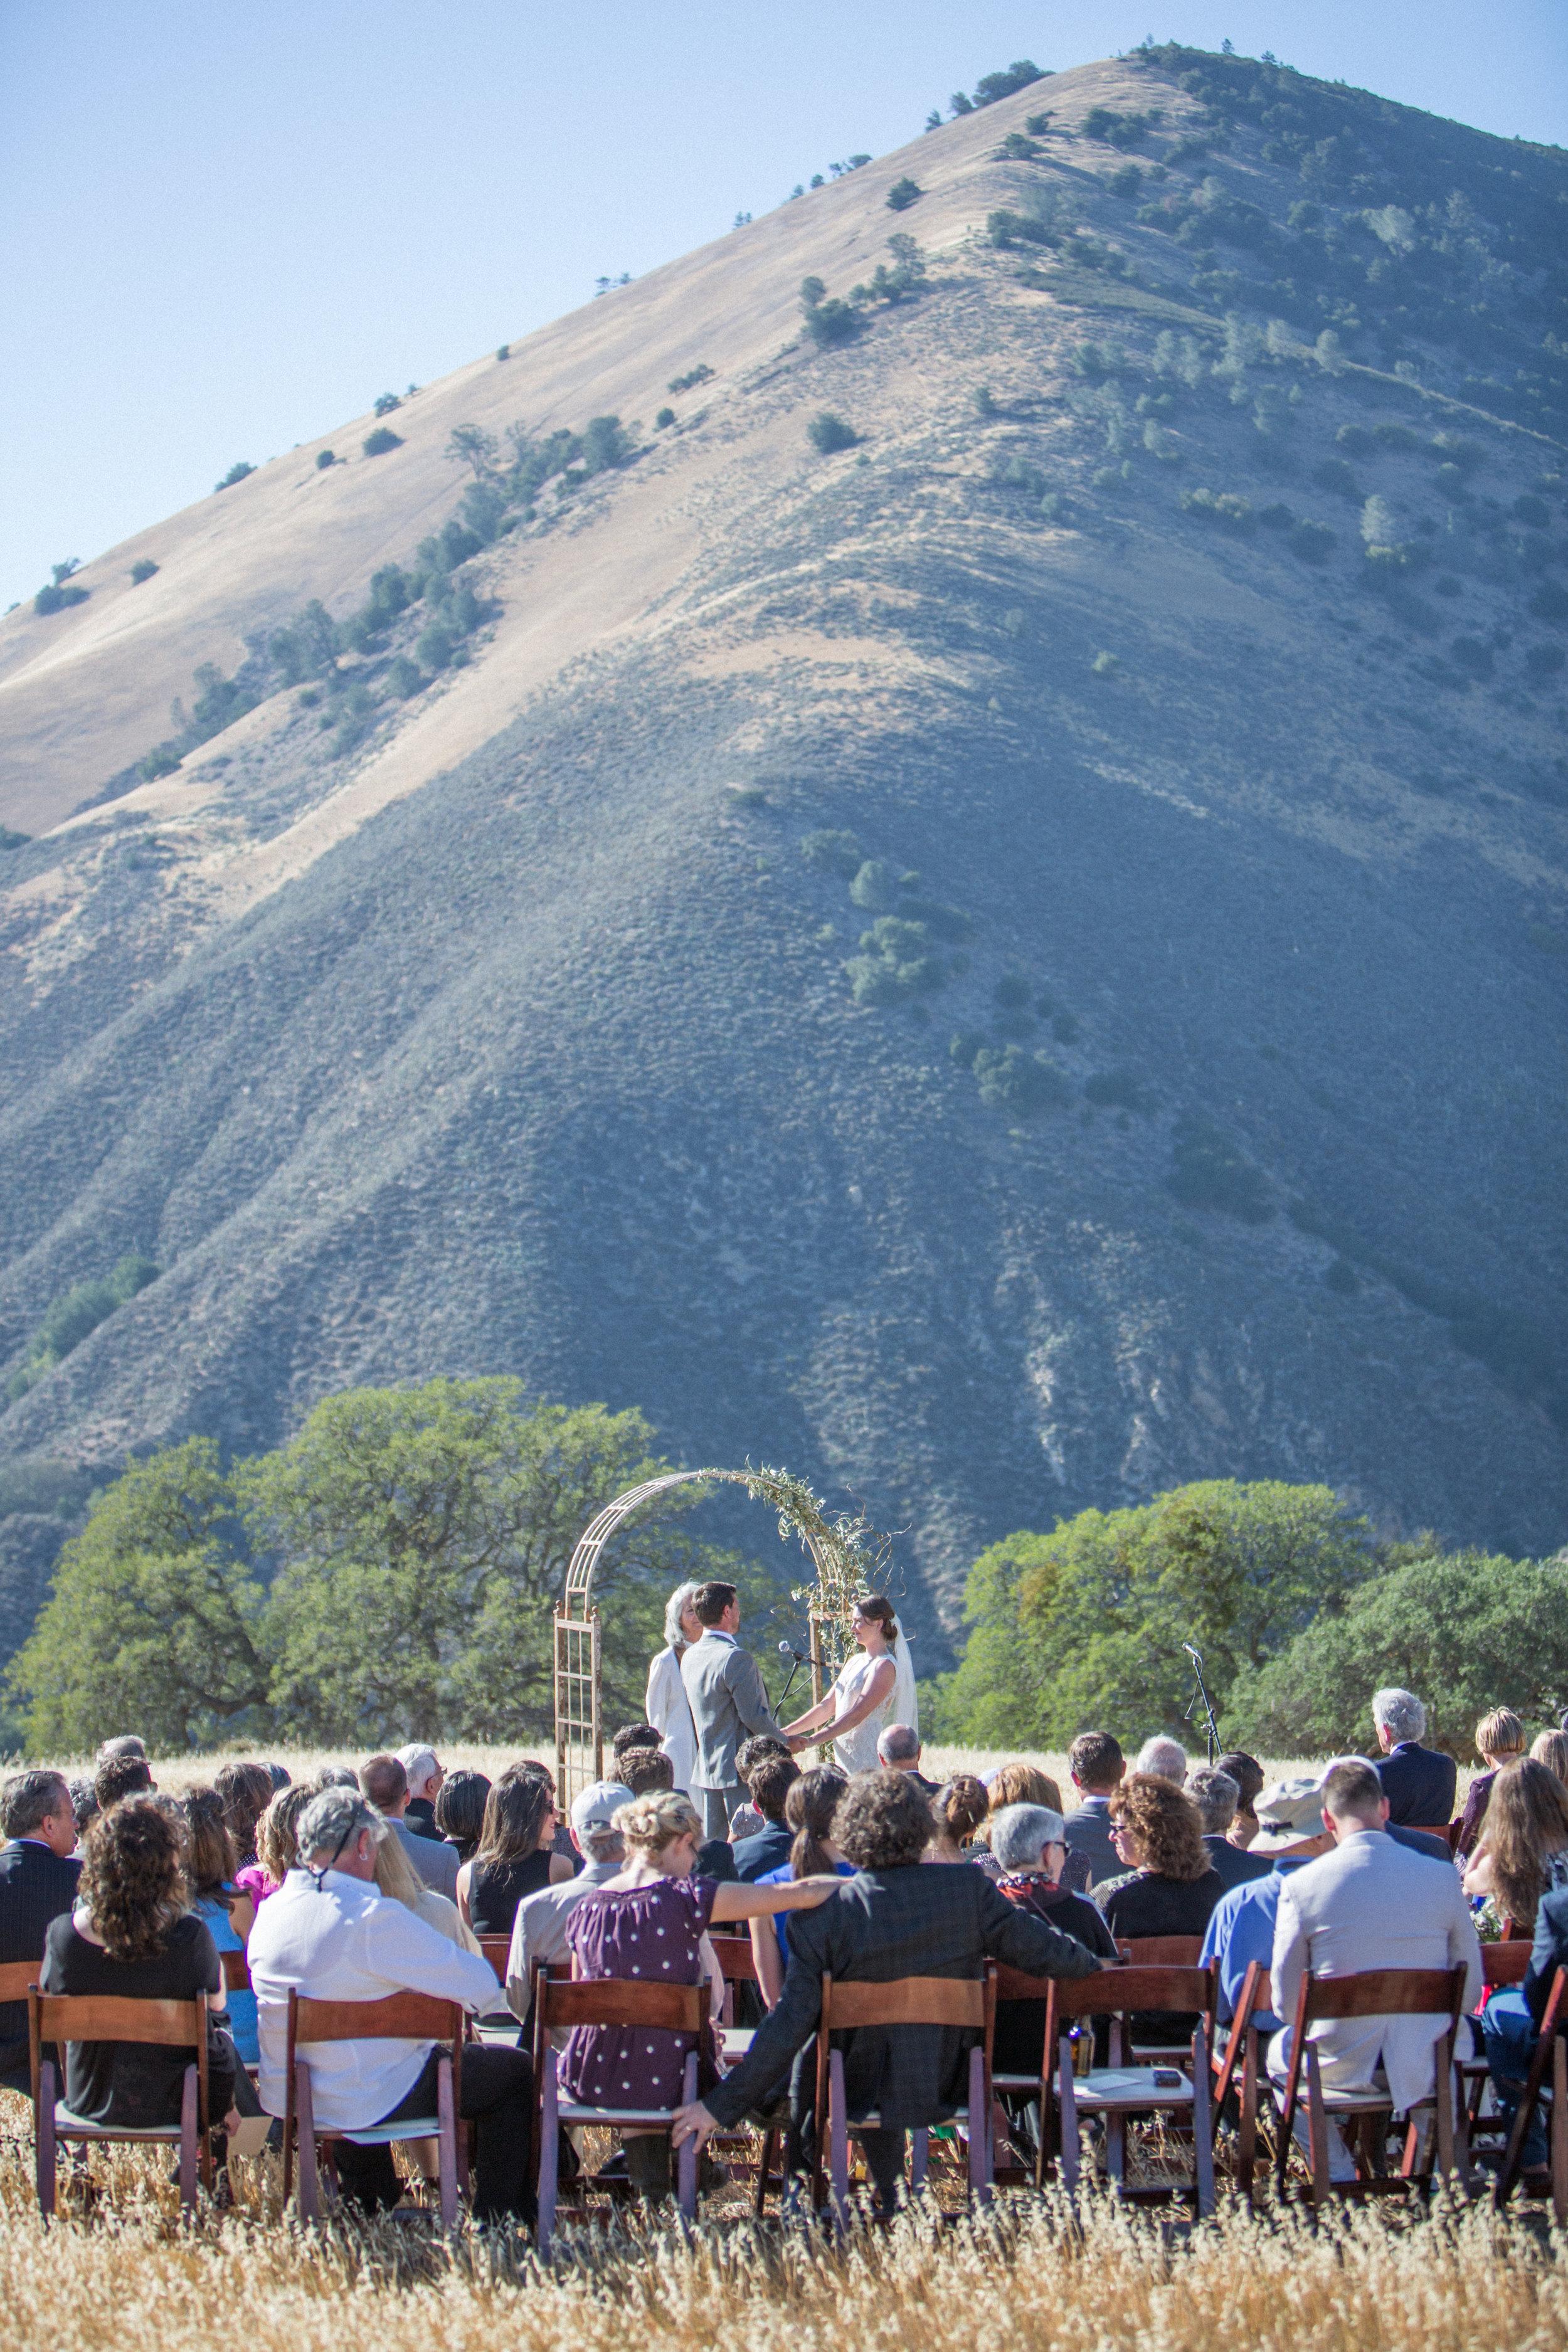 www.santabarbarawedding.com | Kiel Rucker Photography | Joelle Charming Wedding Planner | Figueroa Mountain Farmhouse | Ceremony